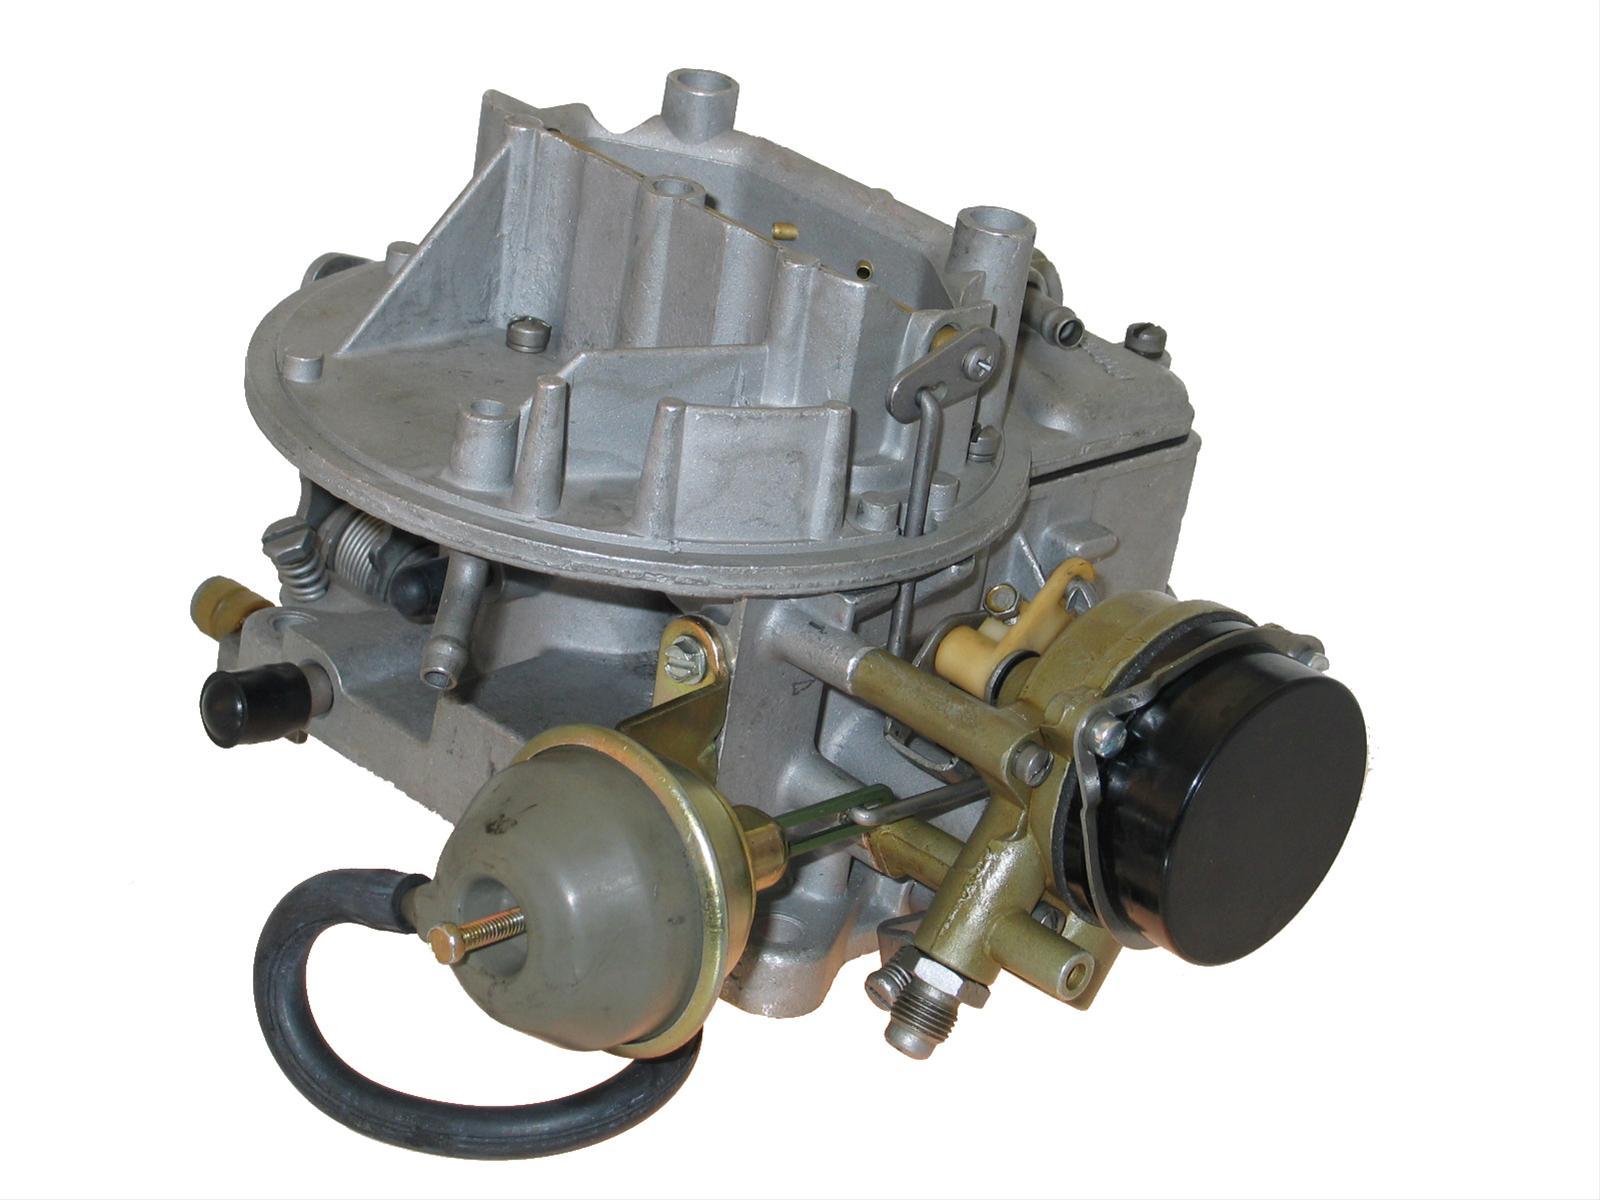 1992 Isuzu Pickup 2 3 Carburetor Diagram Together With Chevy Silverado